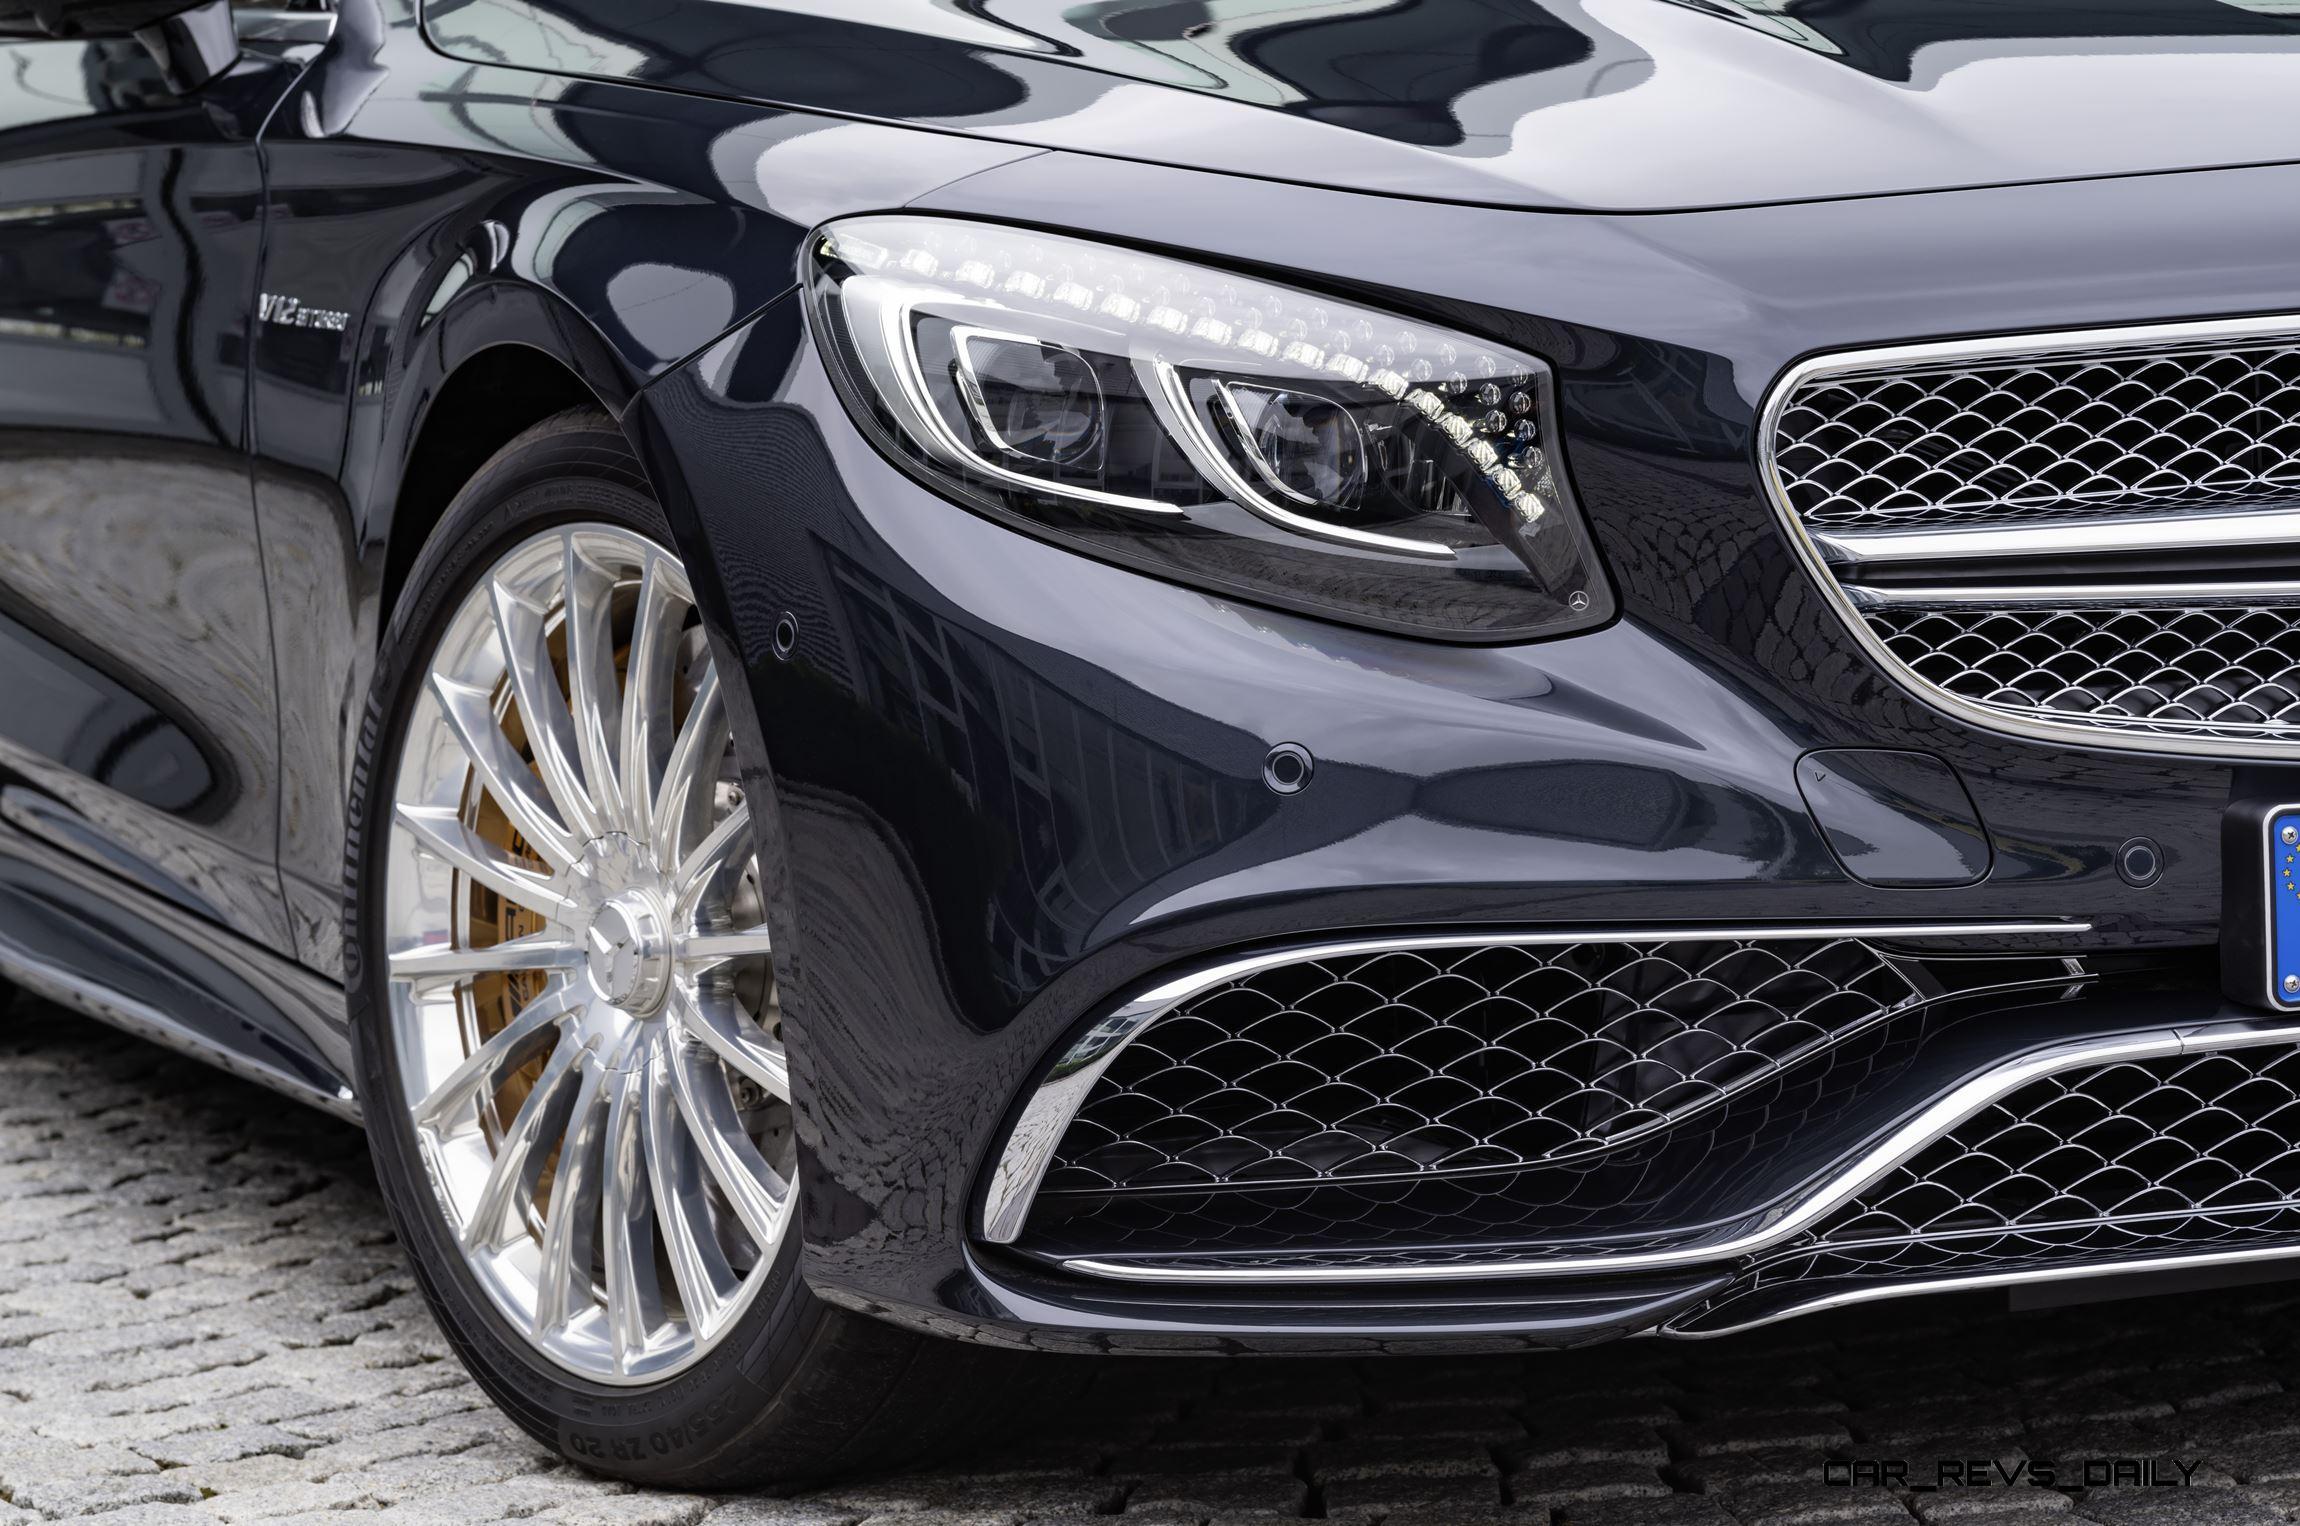 http://www.car-revs-daily.com/wp-content/uploads/2015/12/2017-Mercedes-AMG-S65-Cabriolet-11.jpg